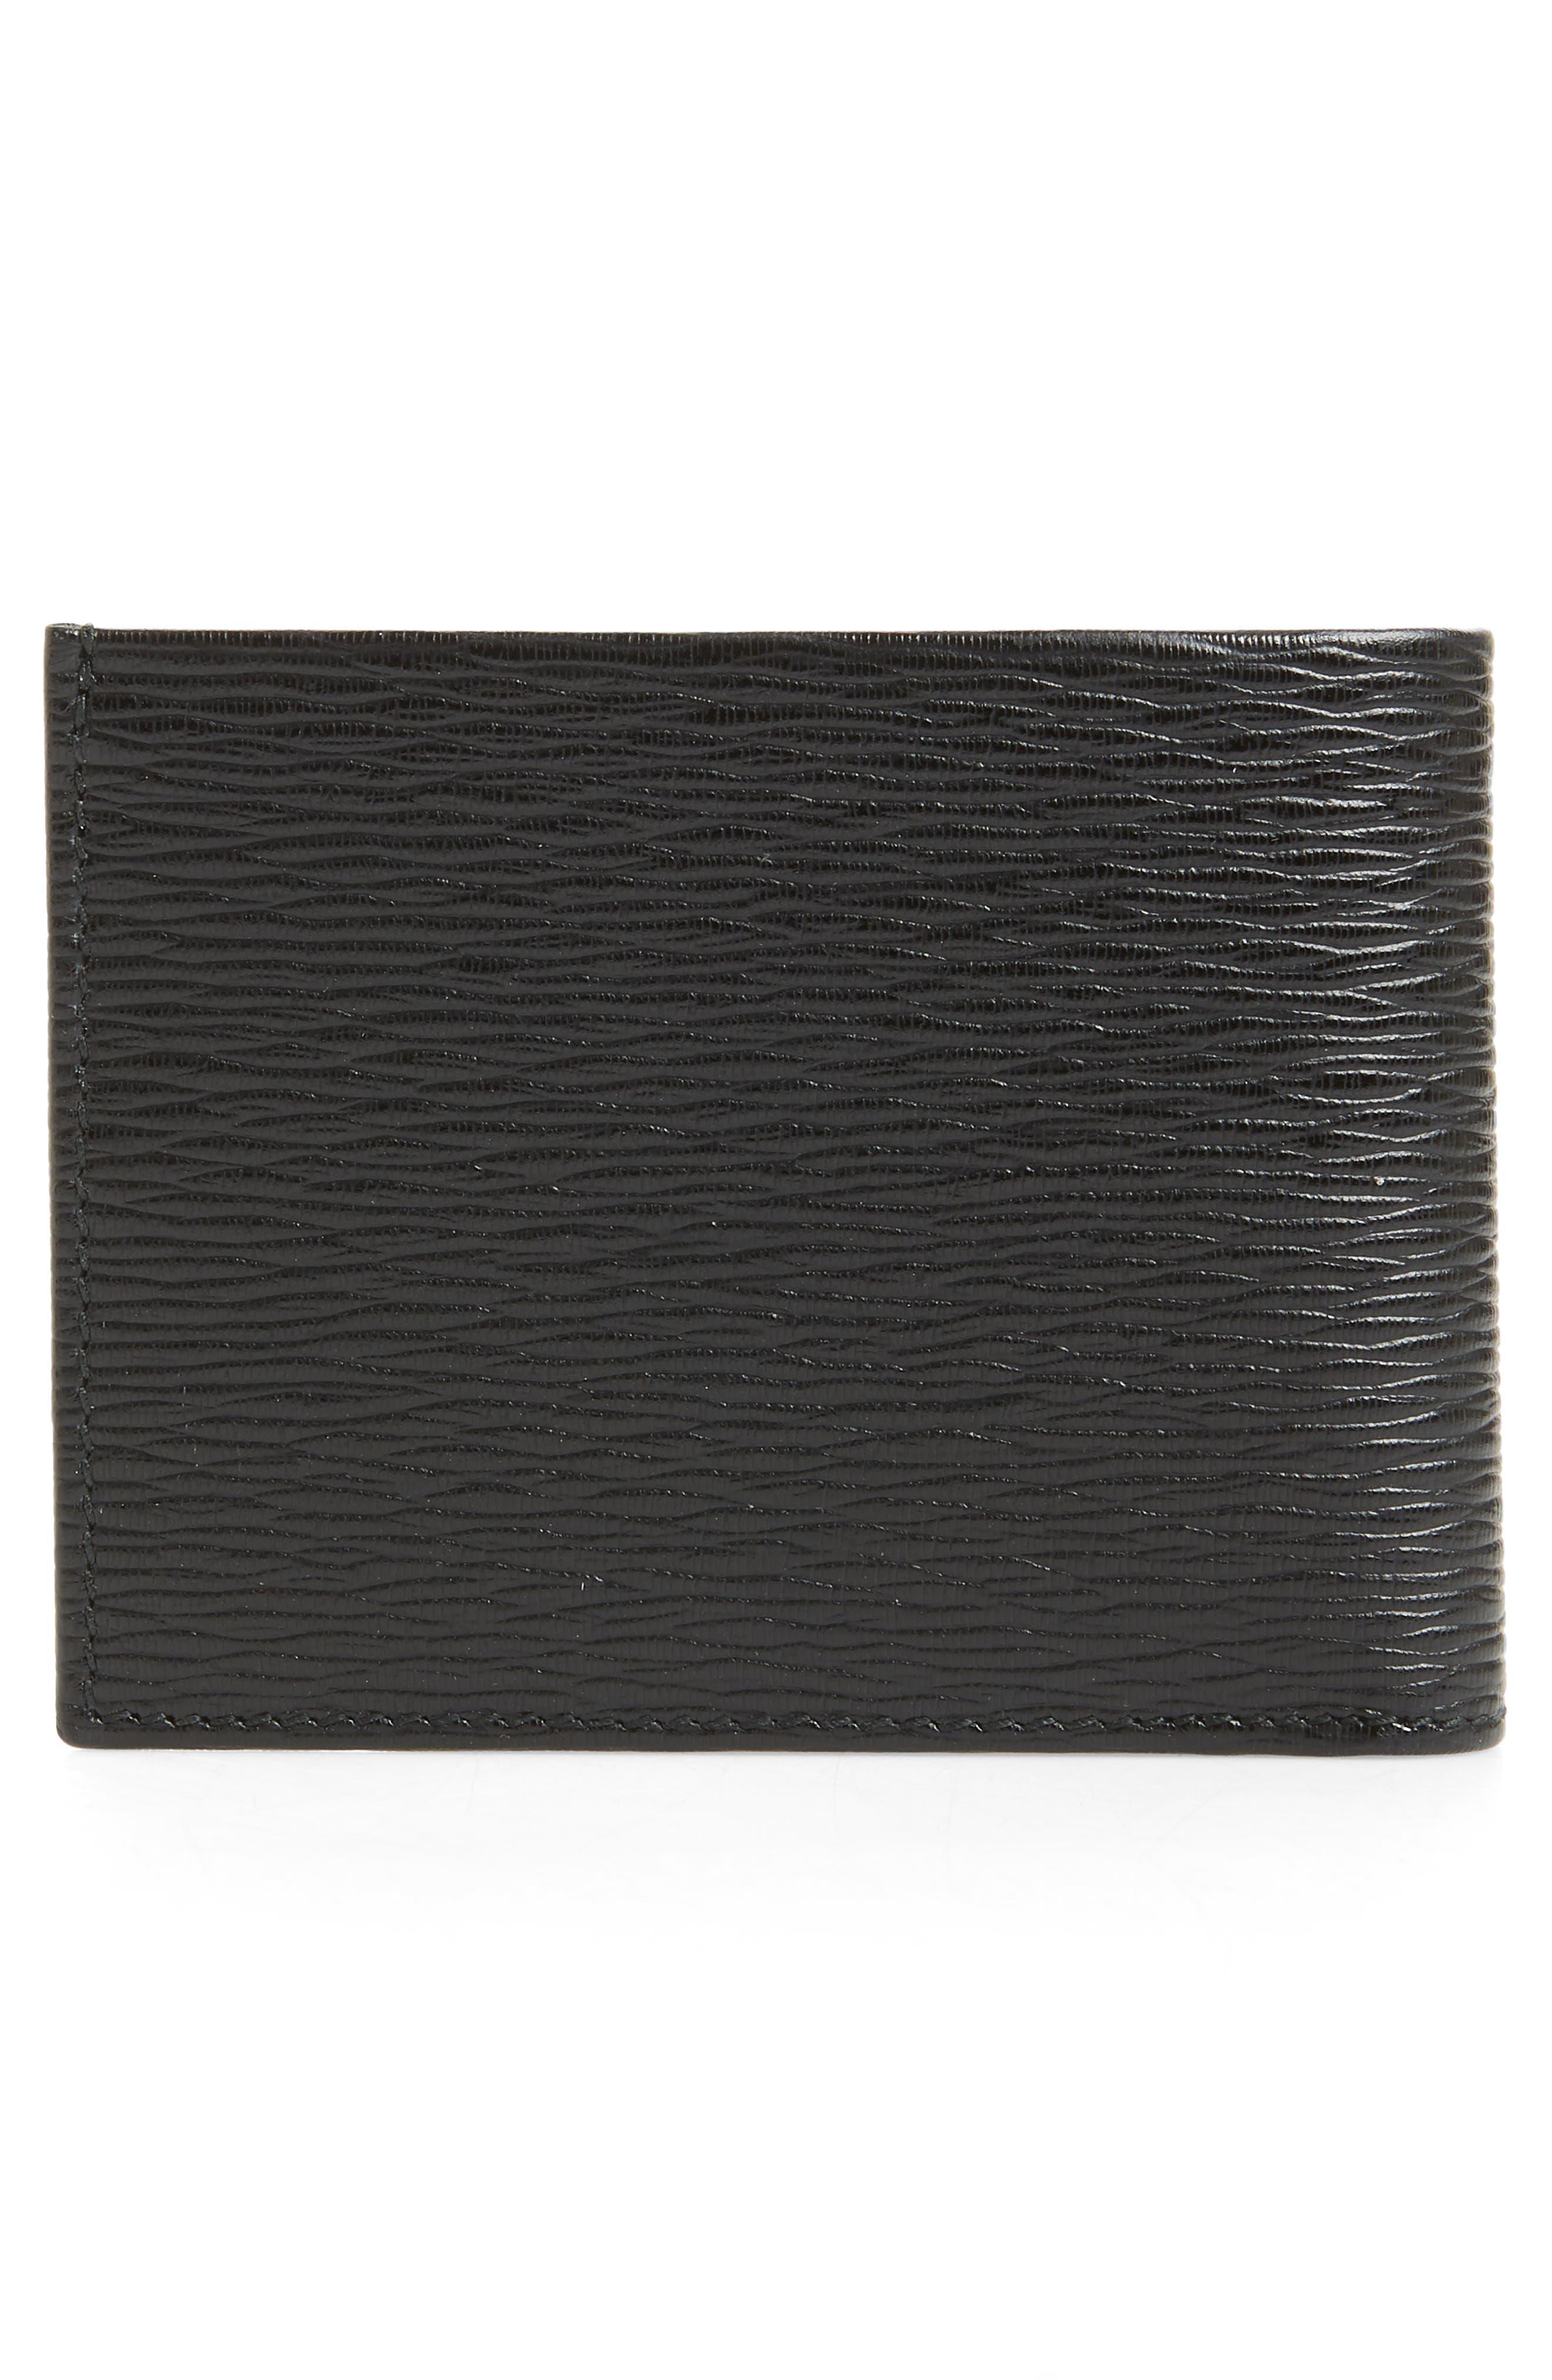 Revival Leather Card Case,                             Alternate thumbnail 3, color,                             BLACK